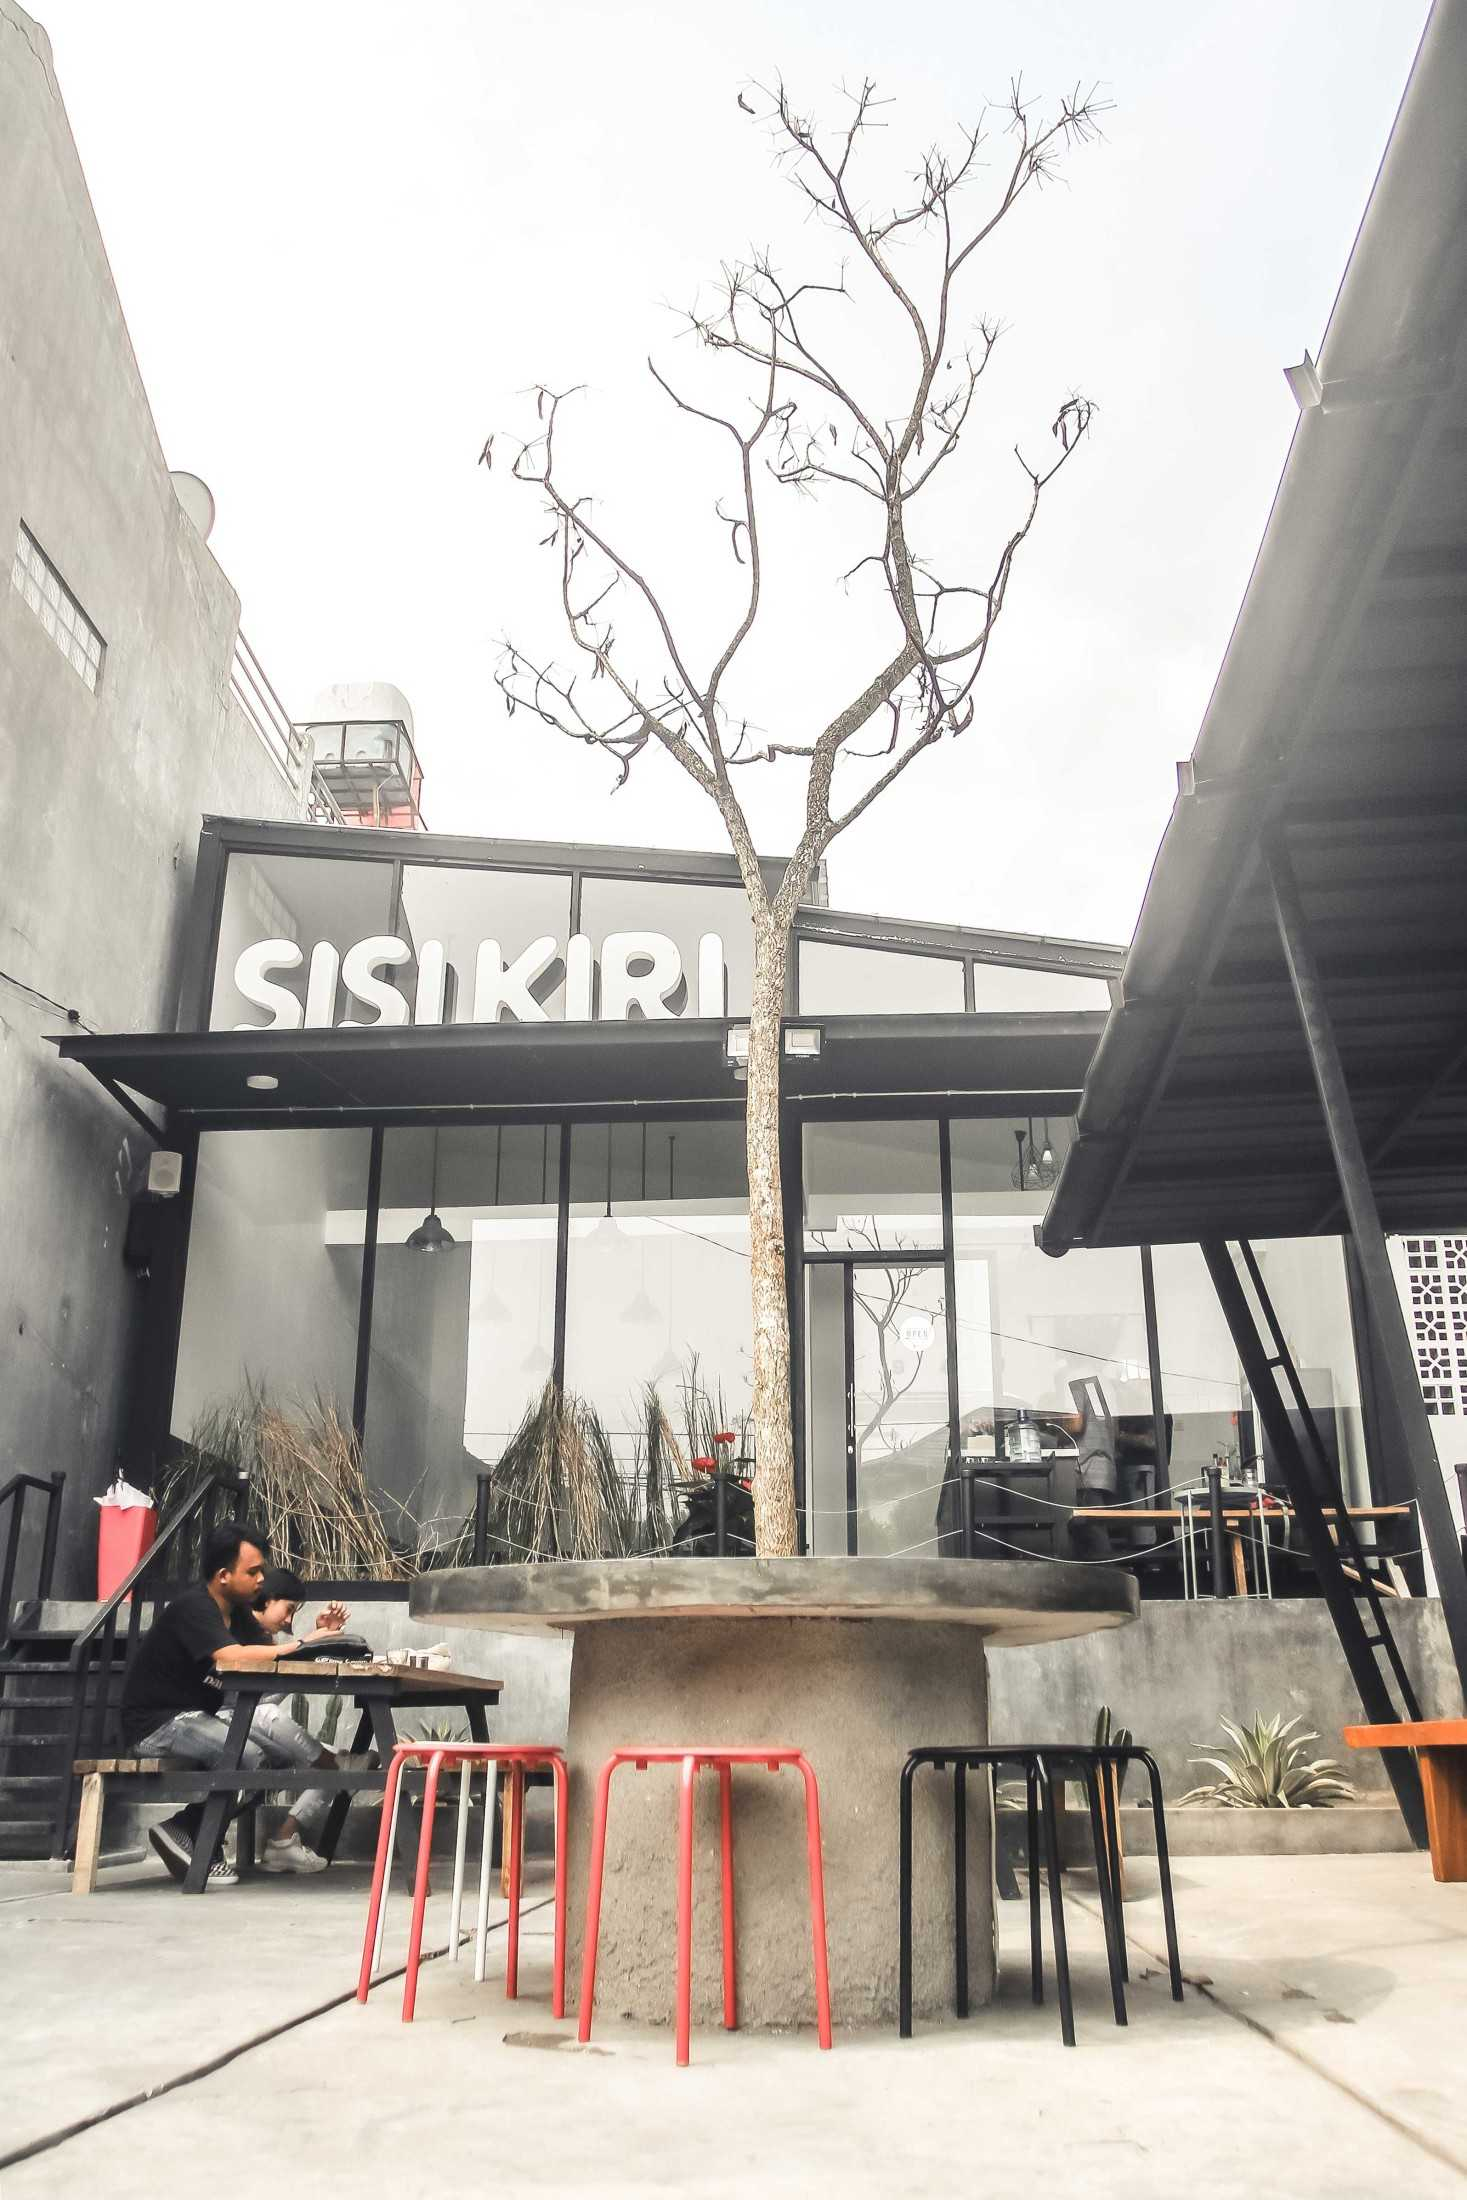 Lingkar Karya Sisi Kiri Bogor, Jawa Barat, Indonesia Bogor, Jawa Barat, Indonesia Lingkar-Karya-Sisi-Kiri  111836